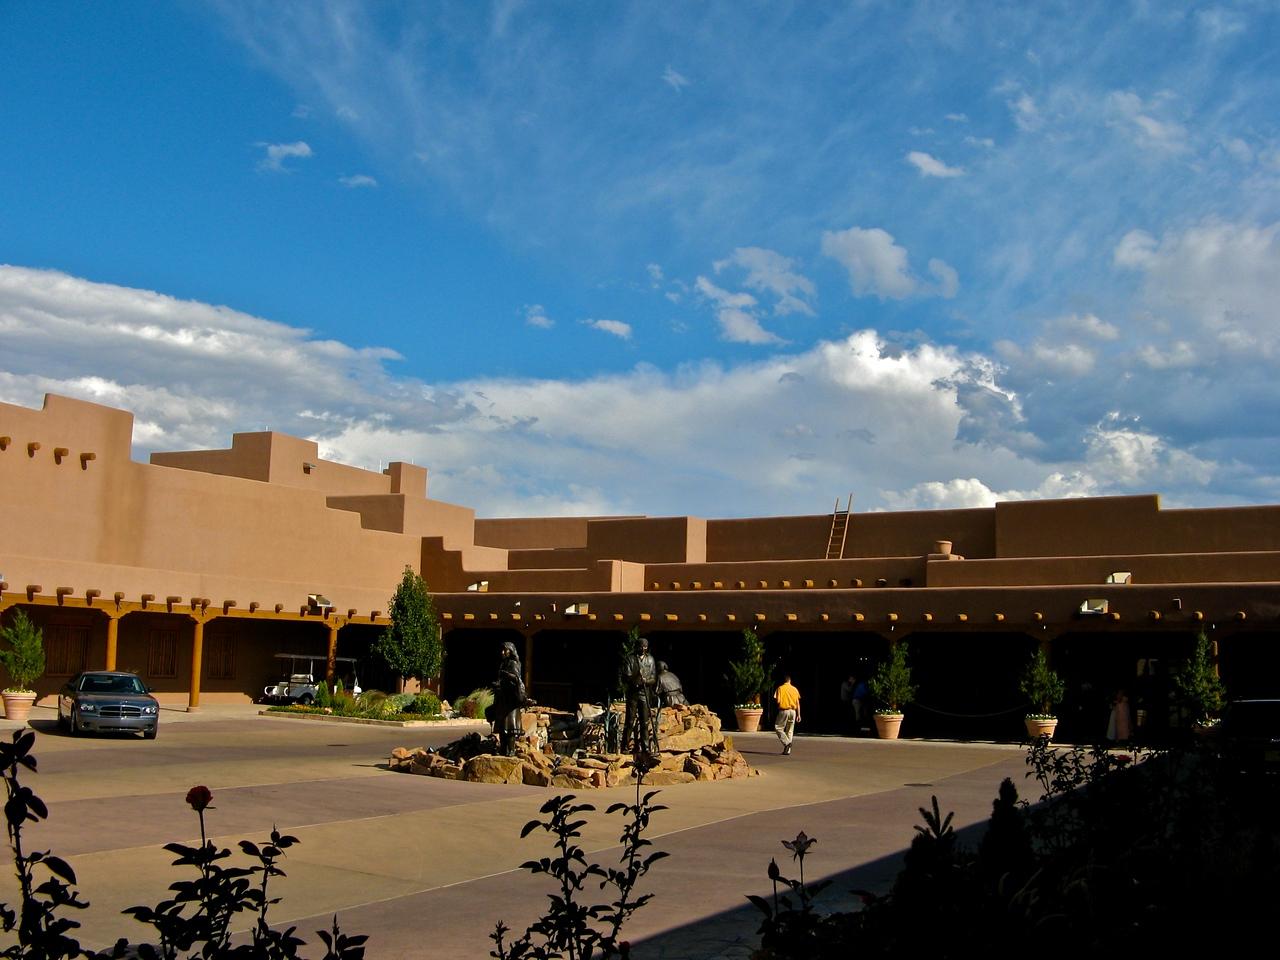 The Hyatt Tamaya Resort sits between Albuquerque and Santa Fe.